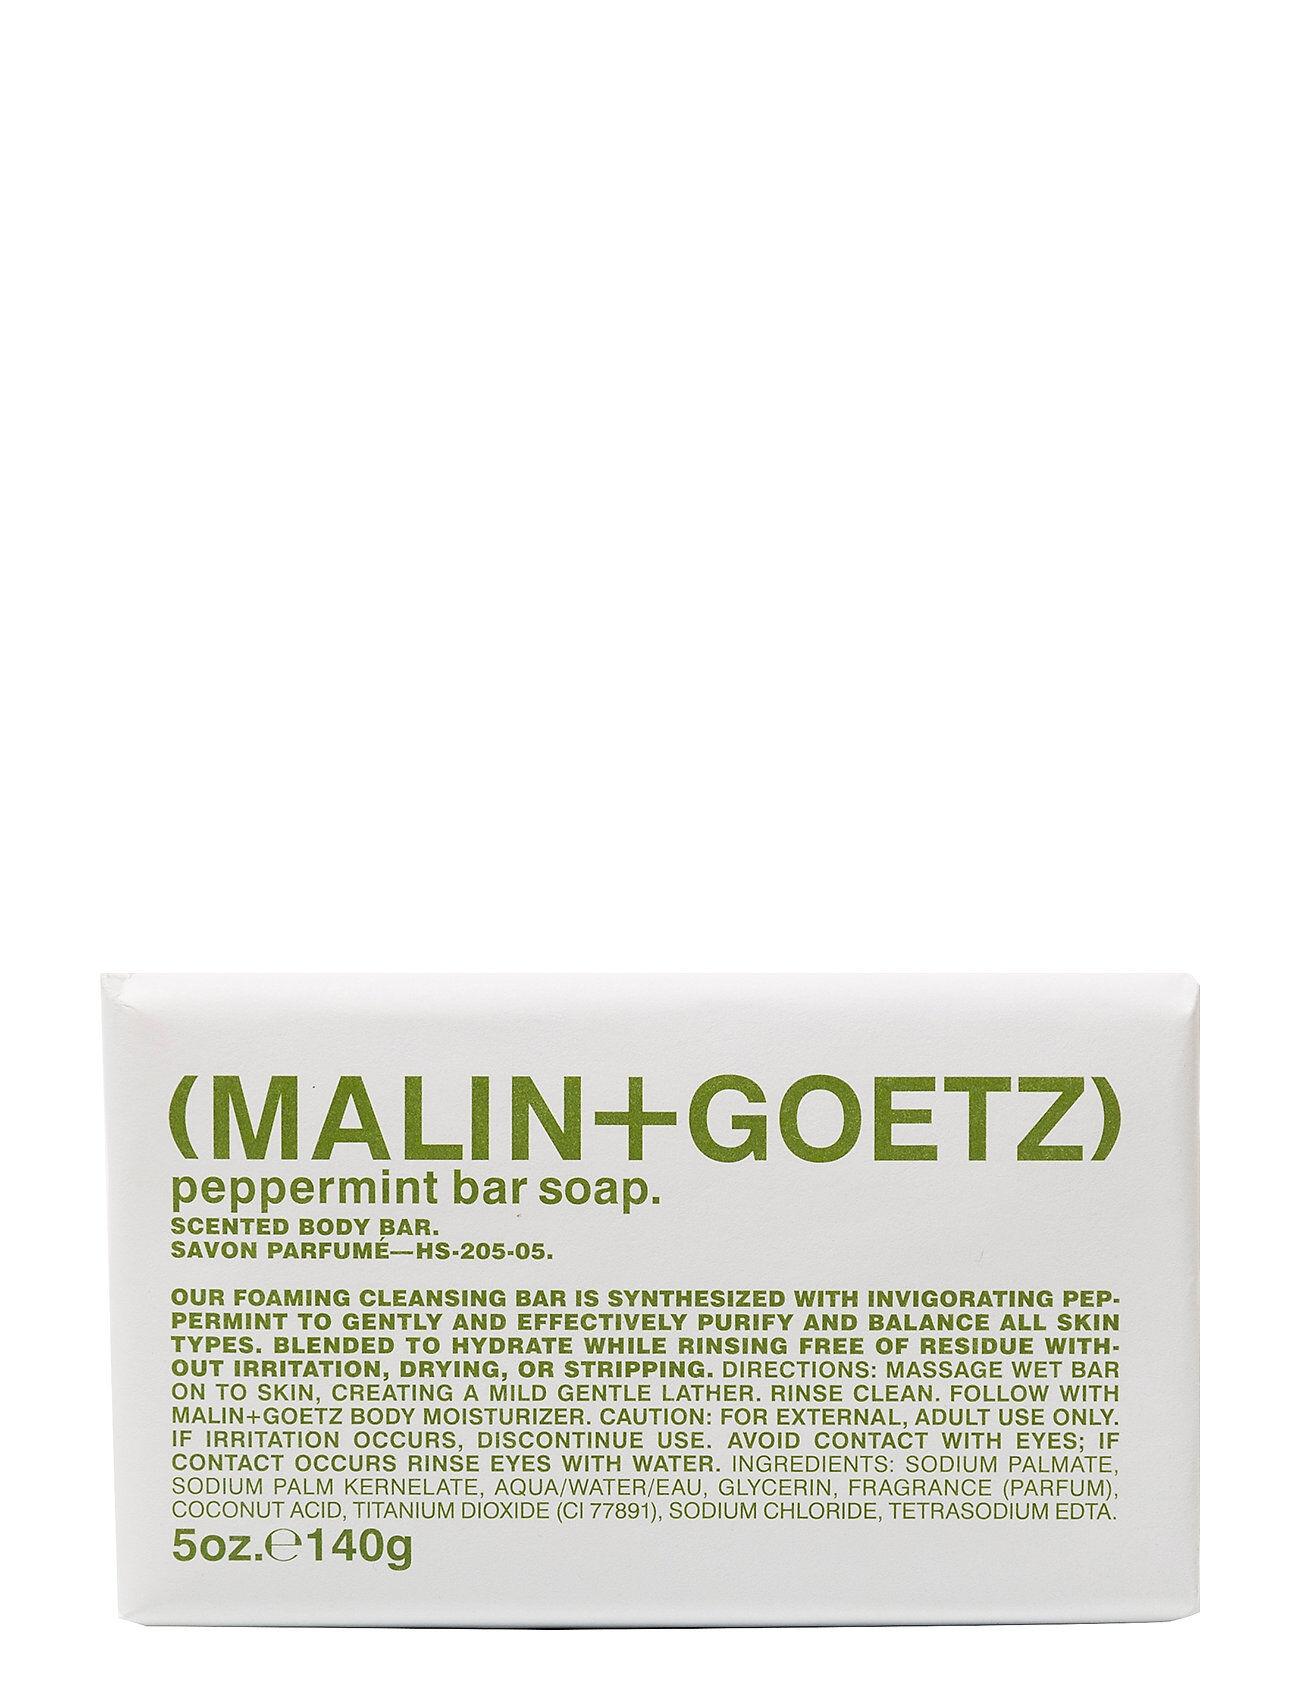 MALIN+GOETZ Peppermint Bar Soap Suihkugeeli Nude MALIN+GOETZ